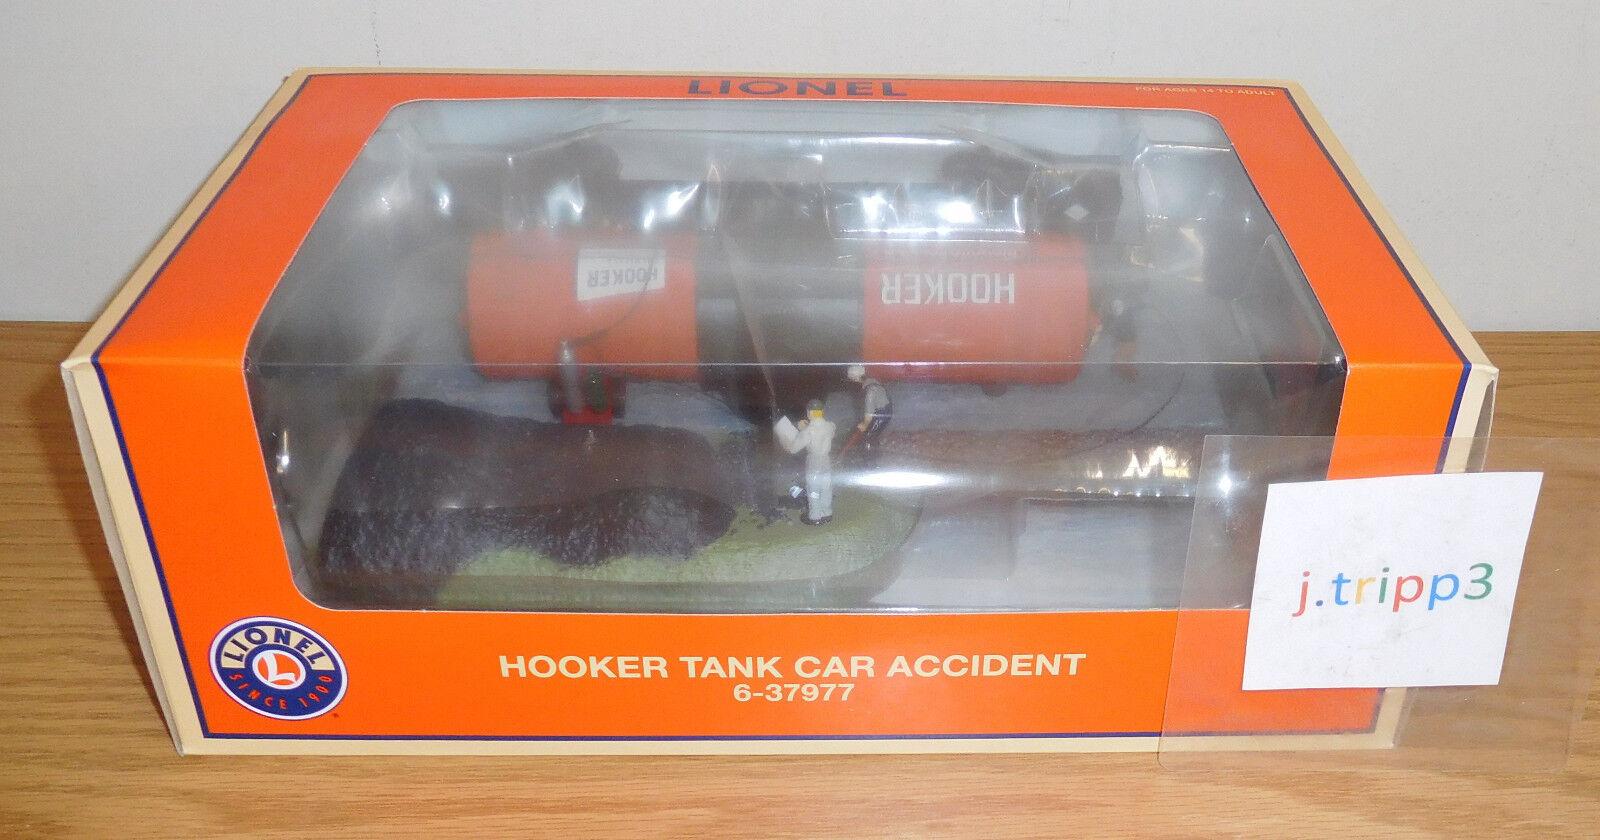 LIONEL 6-37977 HOOKER TANK CAR ACCIDENT SCENE OPERATING TRAIN ACCESSORY O GAUGE